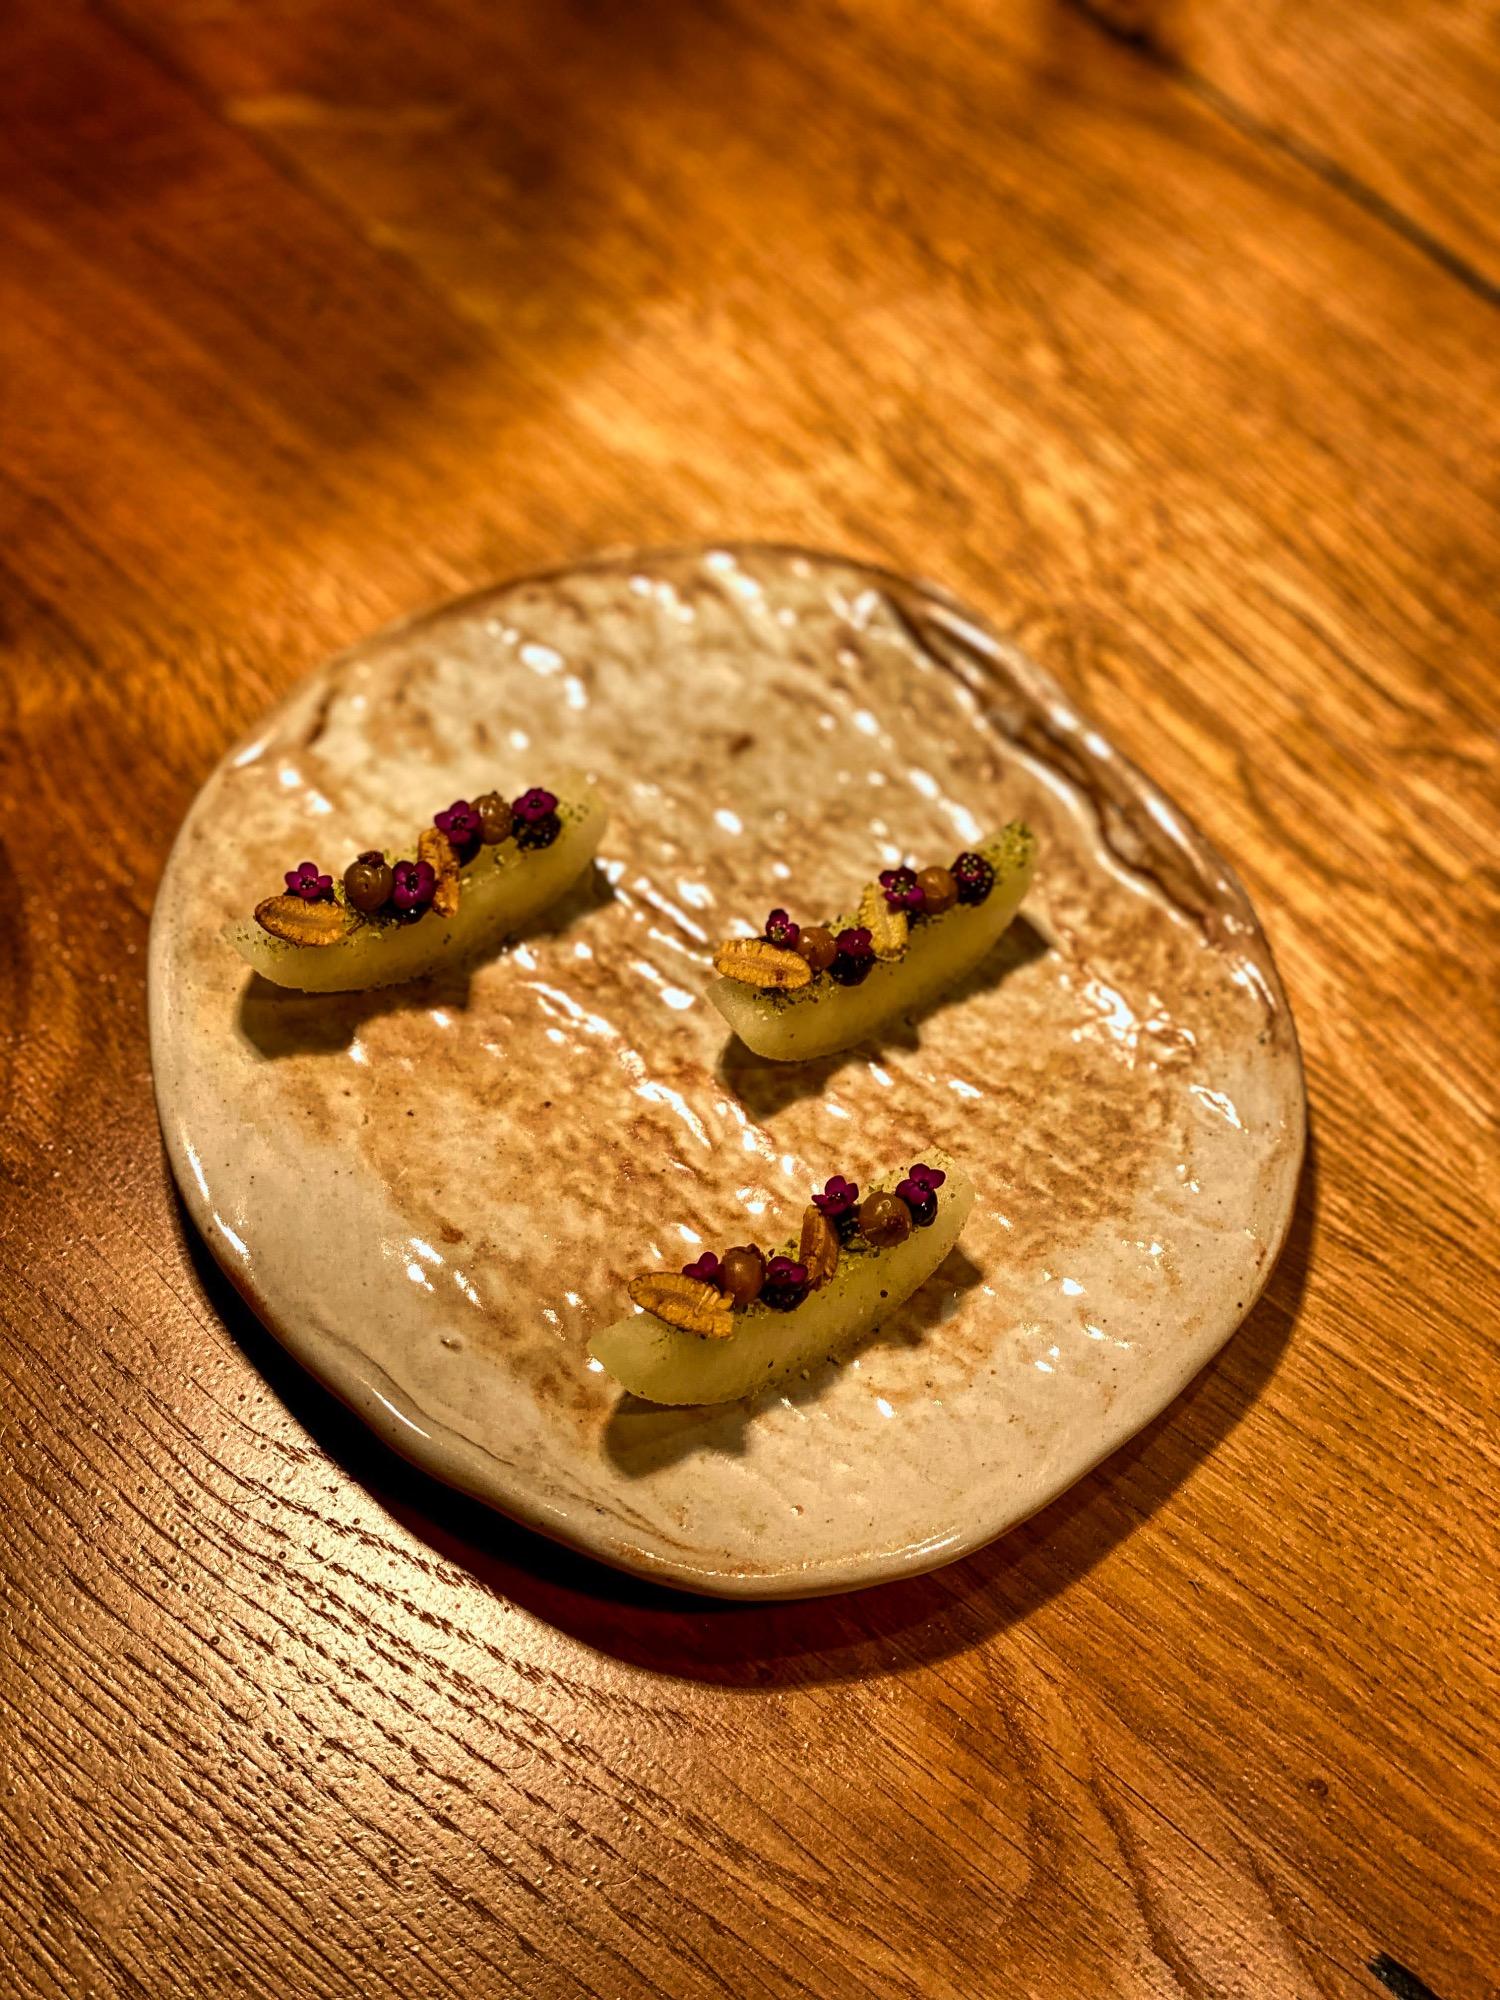 img_5888_salt_budapest_restaurant_jokuti_vilagevo.jpeg